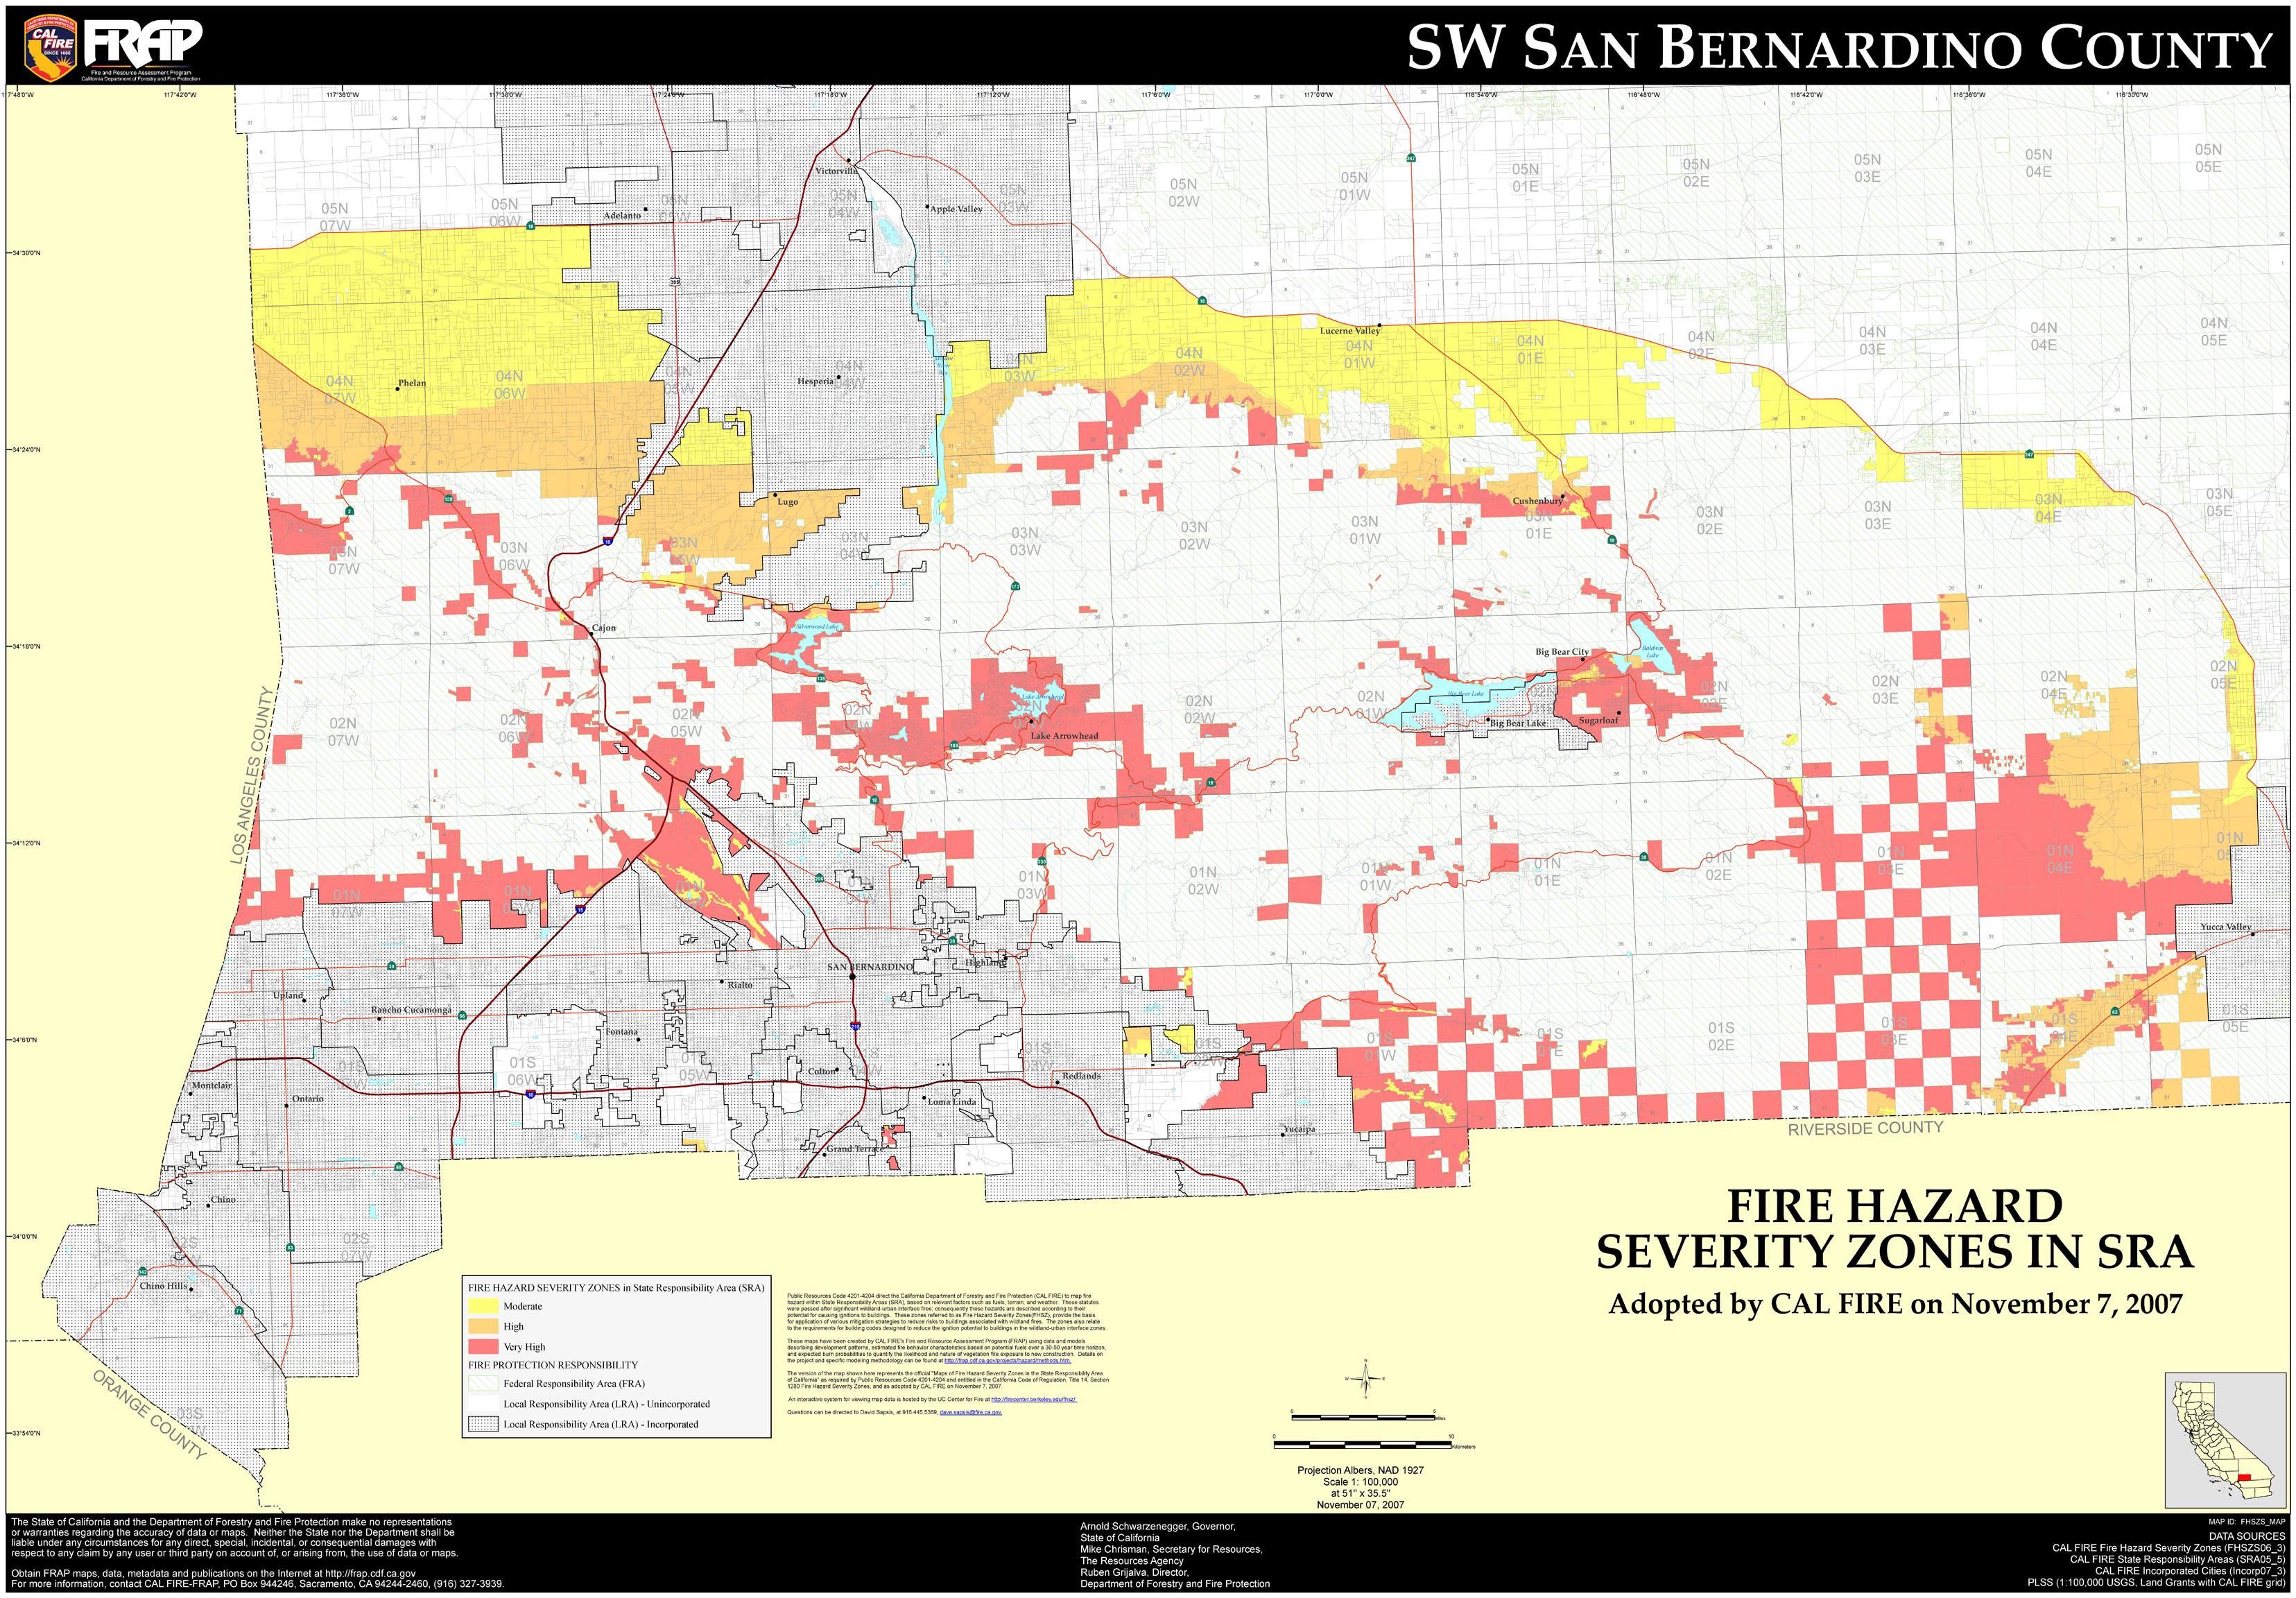 Map Of San Bernardino County Cities And Travel Information - Map Of Cities In San Bernardino County California